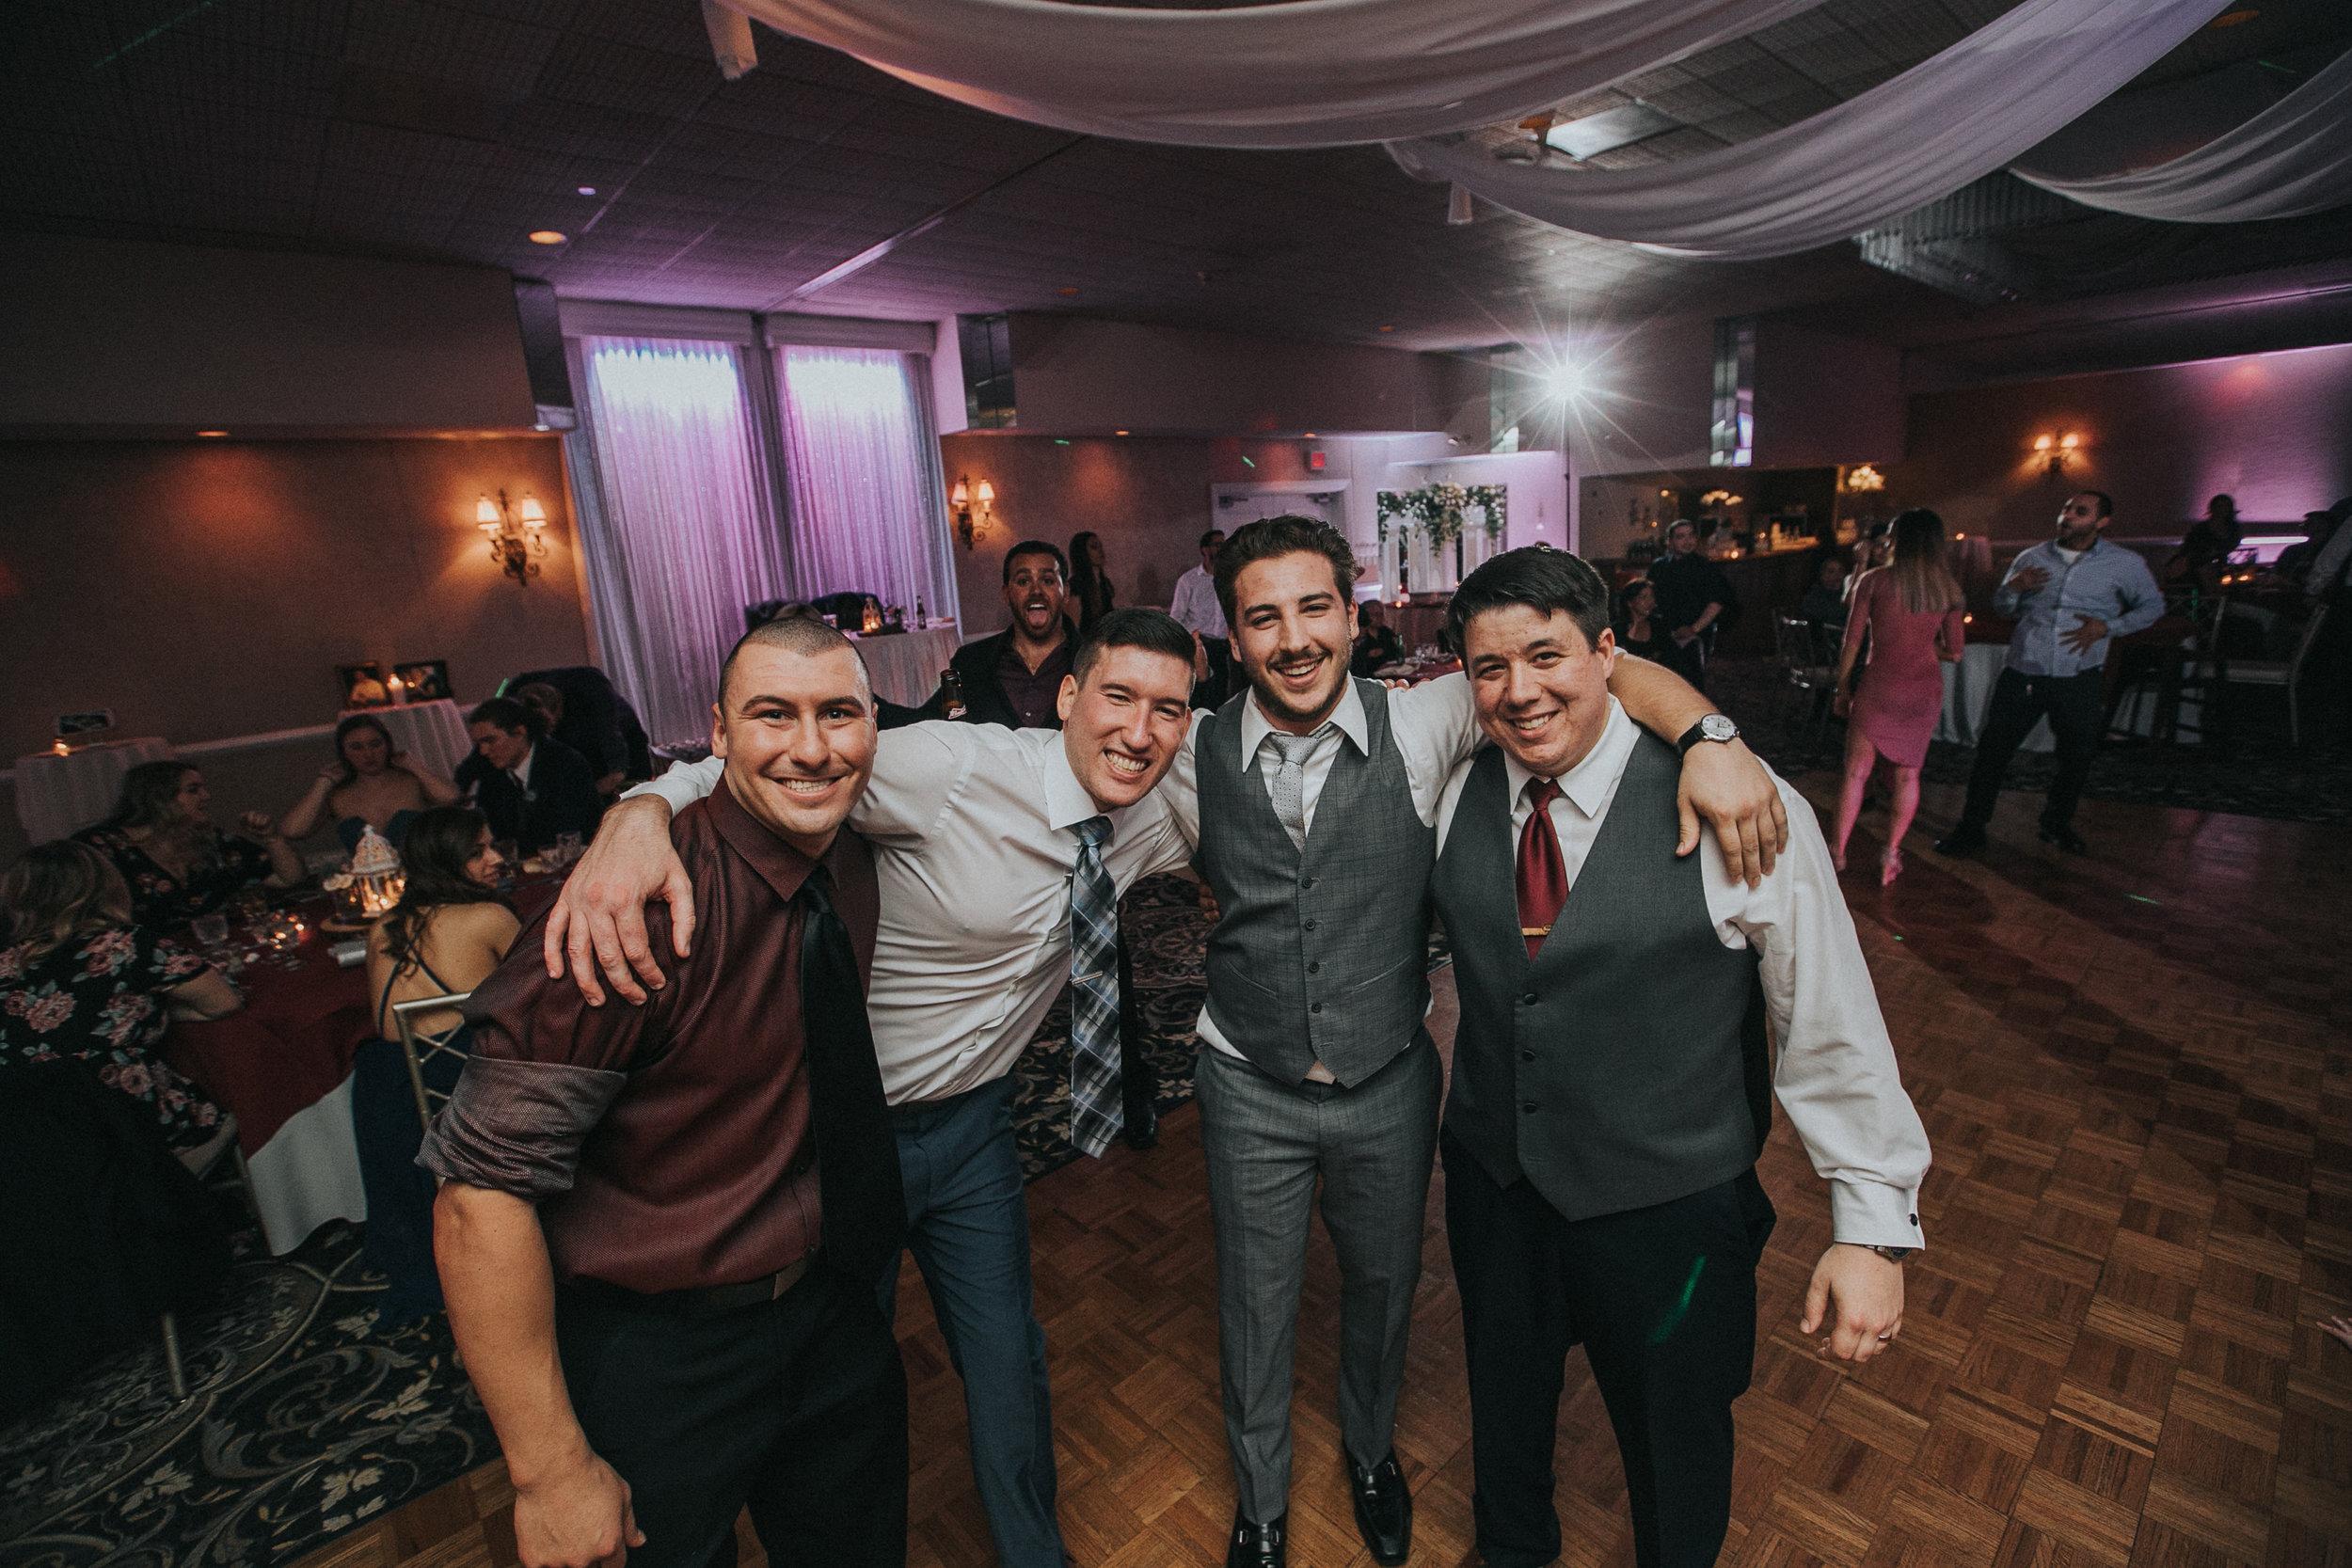 New-Jersey-Wedding-Photographer-ReceptionCenter-Valeria&Mike-Reception (234 of 265).jpg